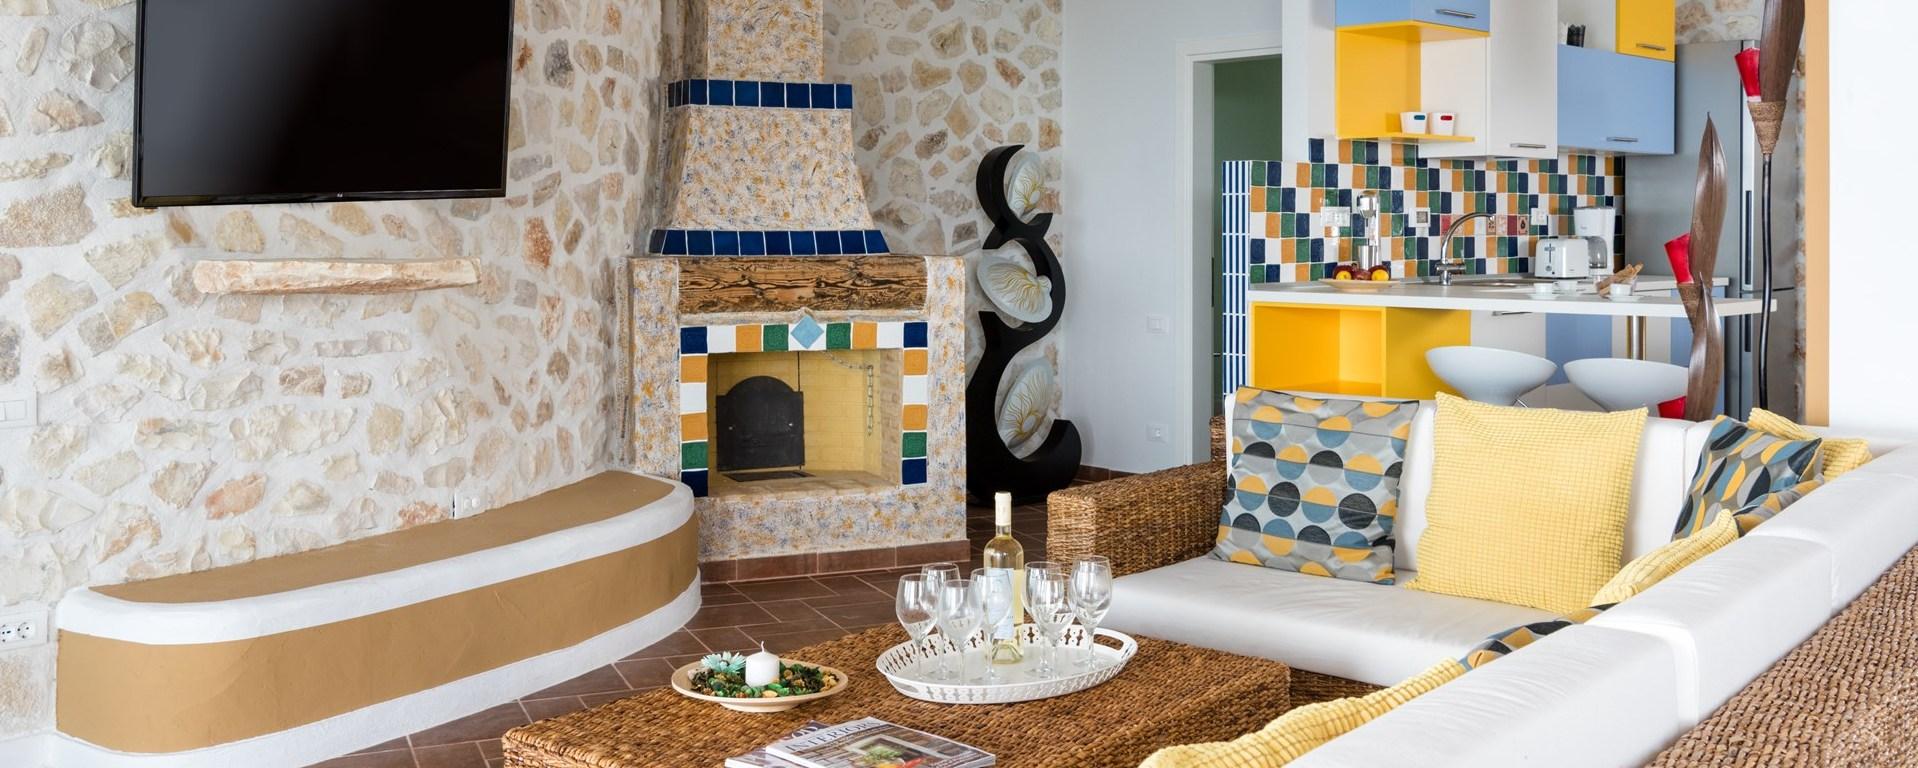 villa-pandora-kitchen-seating